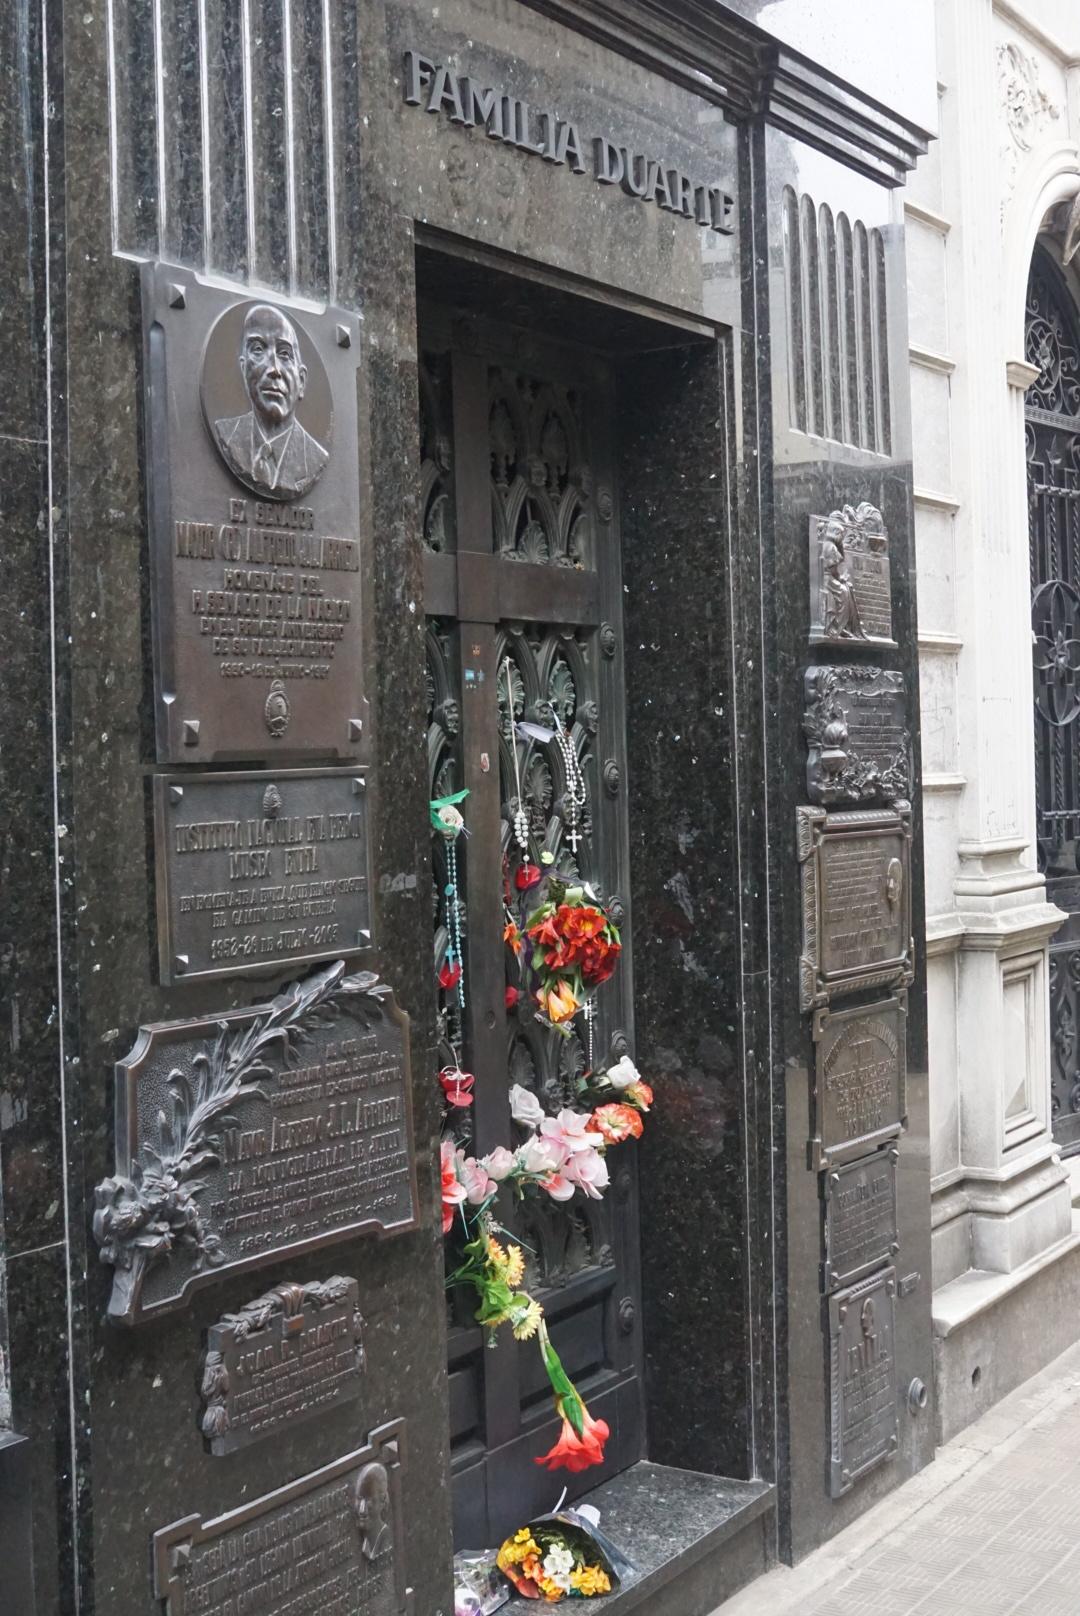 Duarte family grave (Eva Peron)